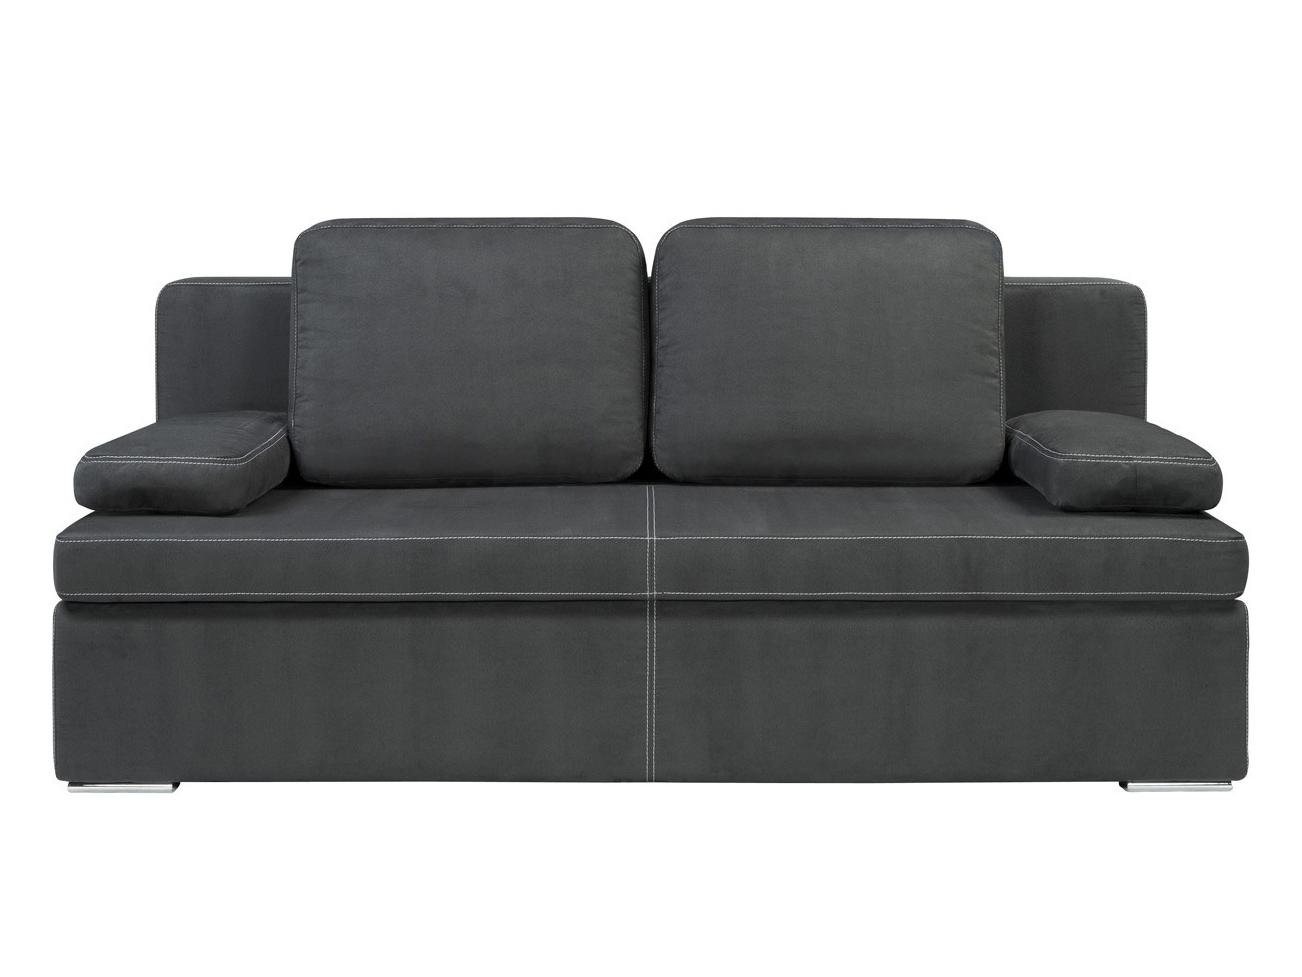 Pohovka - BRW - Tobago Lux 3DL šedá